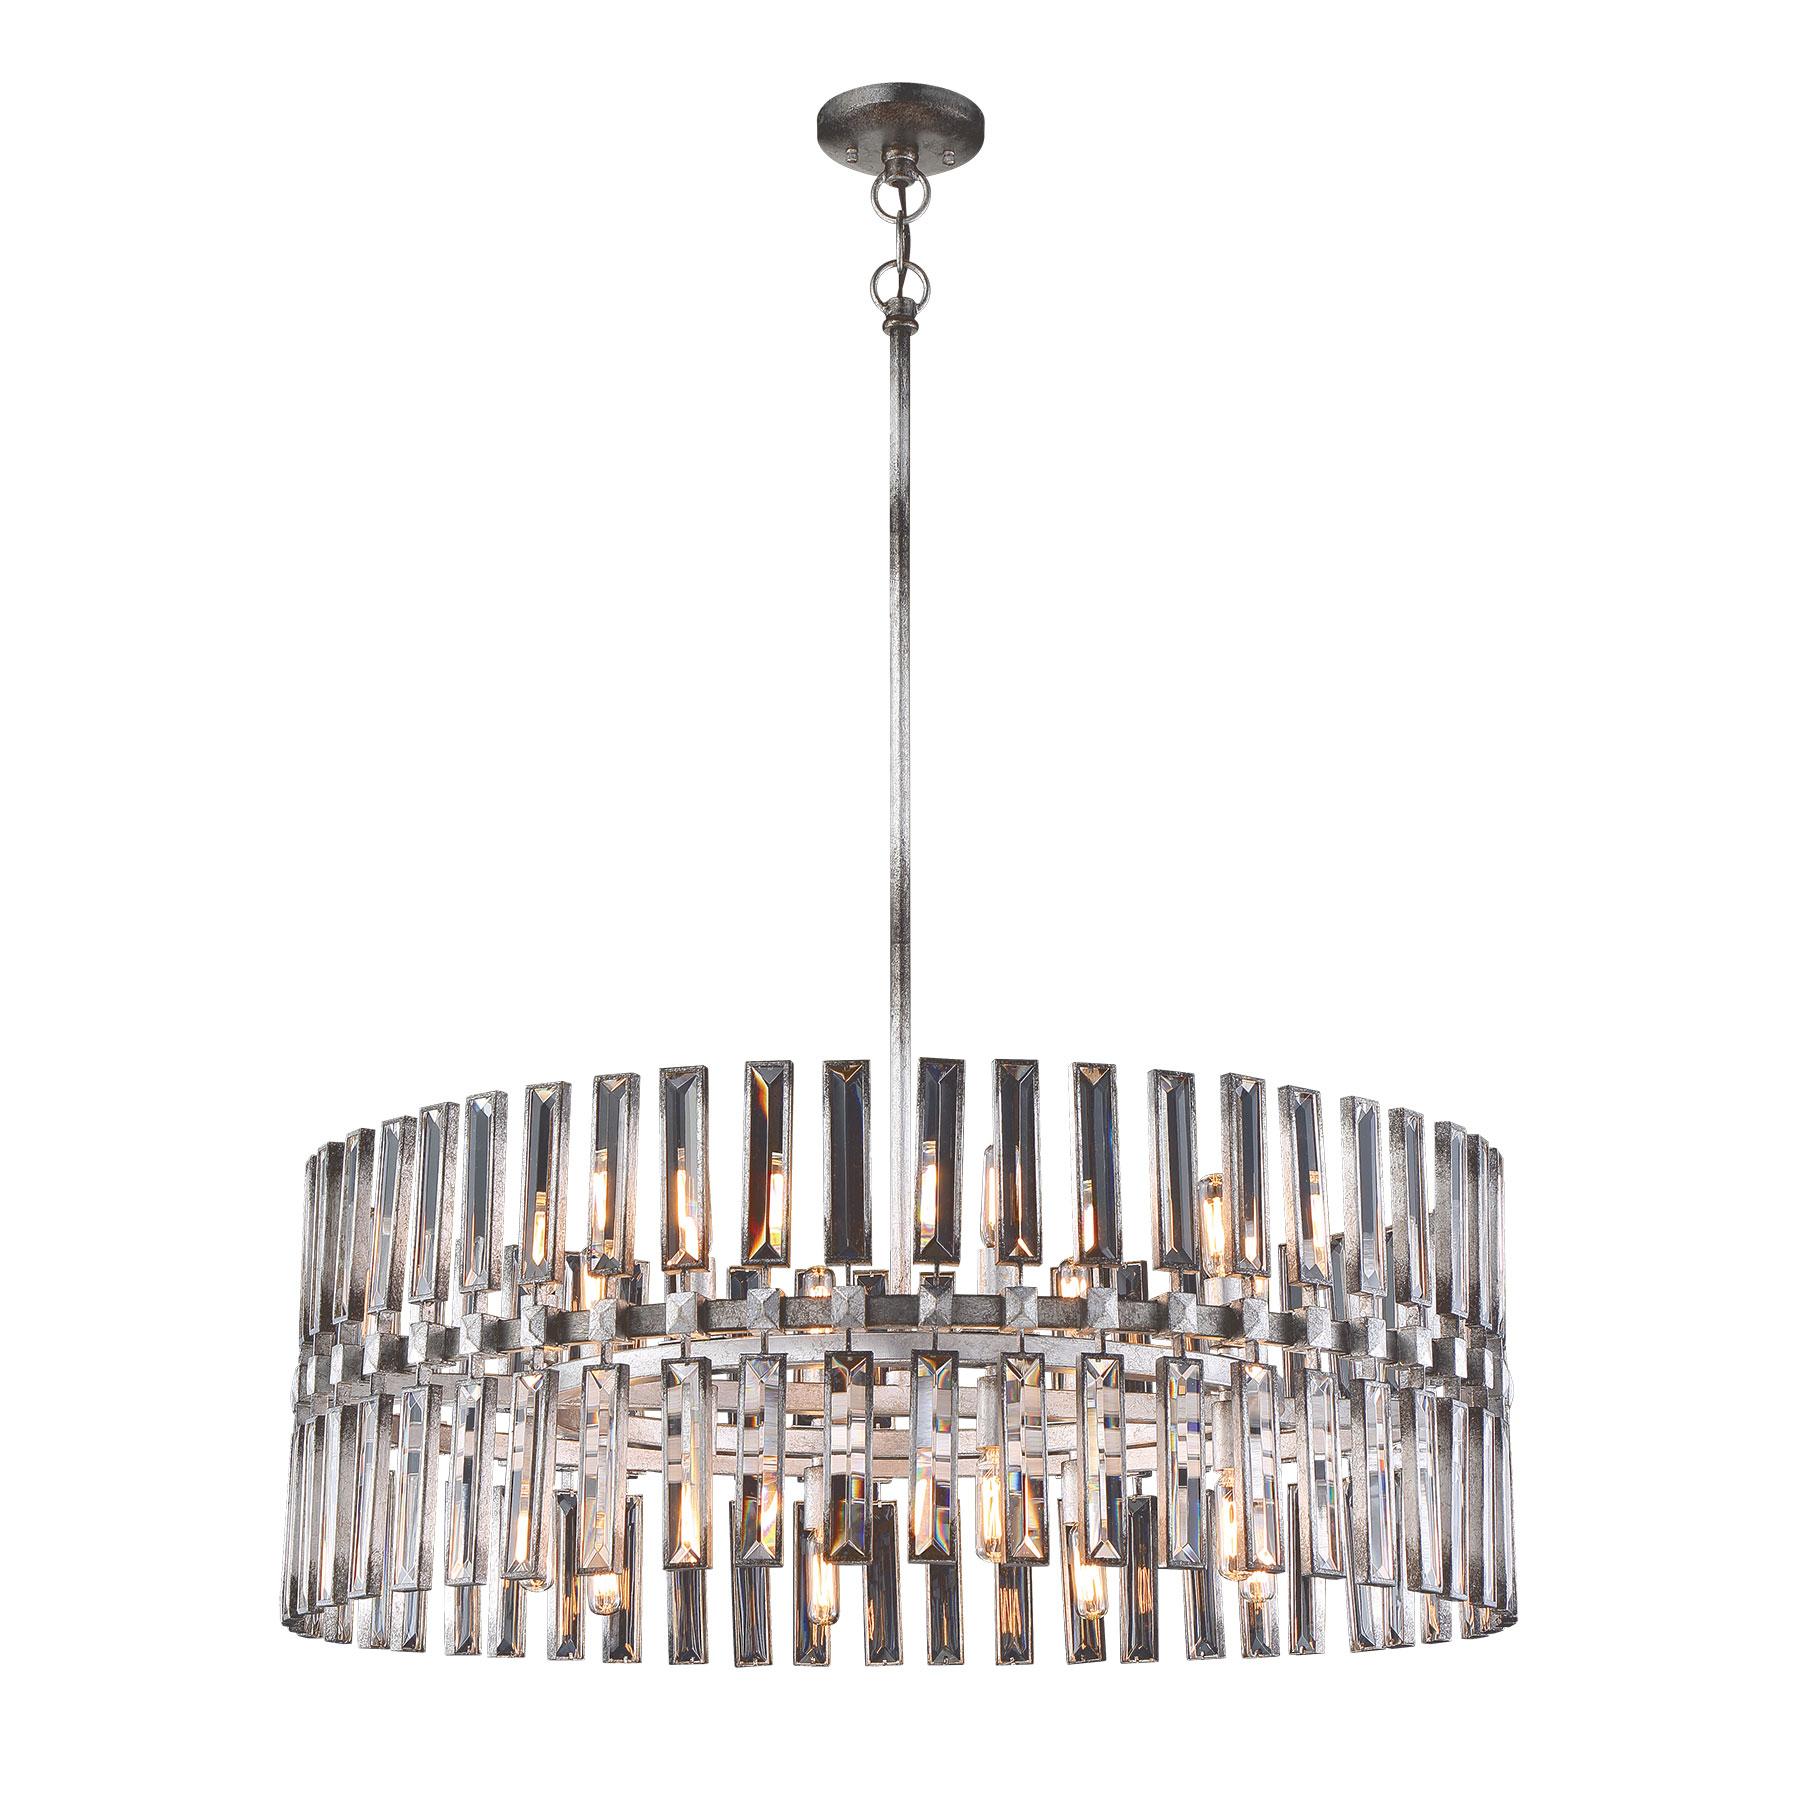 Minka Group® :: Brands :: Metropolitan® :: N7716 700 With Regard To Aurore 4 Light Crystal Chandeliers (View 24 of 30)